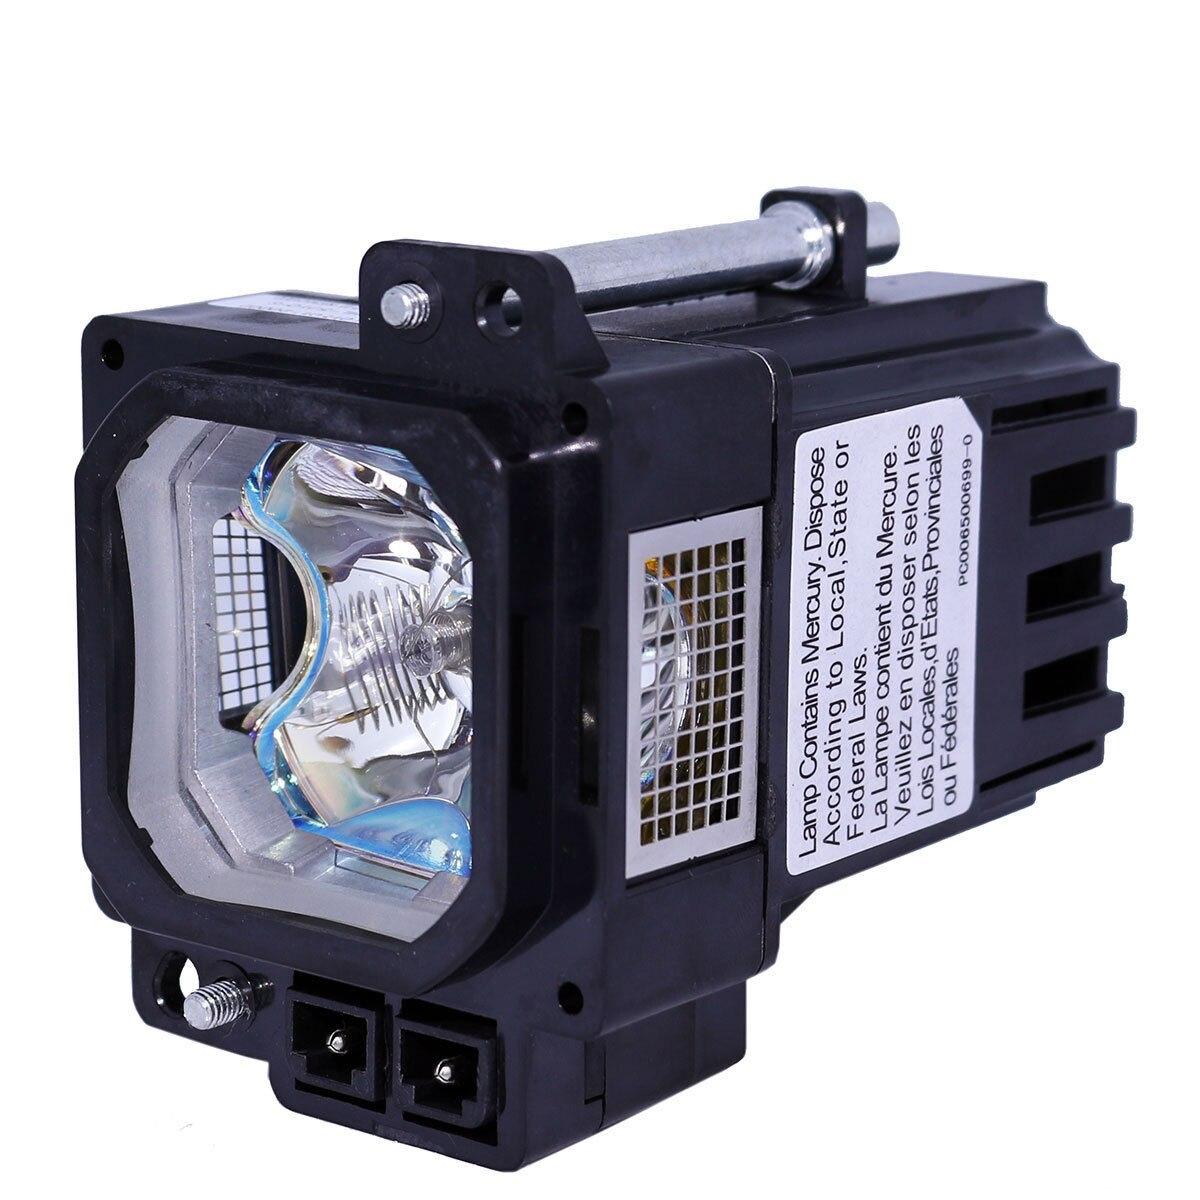 BHL-5010-S LAMP for JVC TV DLA-20U DLA-HD350 DLA-HD550 DLA-HD750 DLA-HD950 DLA-HD990 DLA-RS10 DLA-RS15 DLA-RS20 Projector Bulb<br>